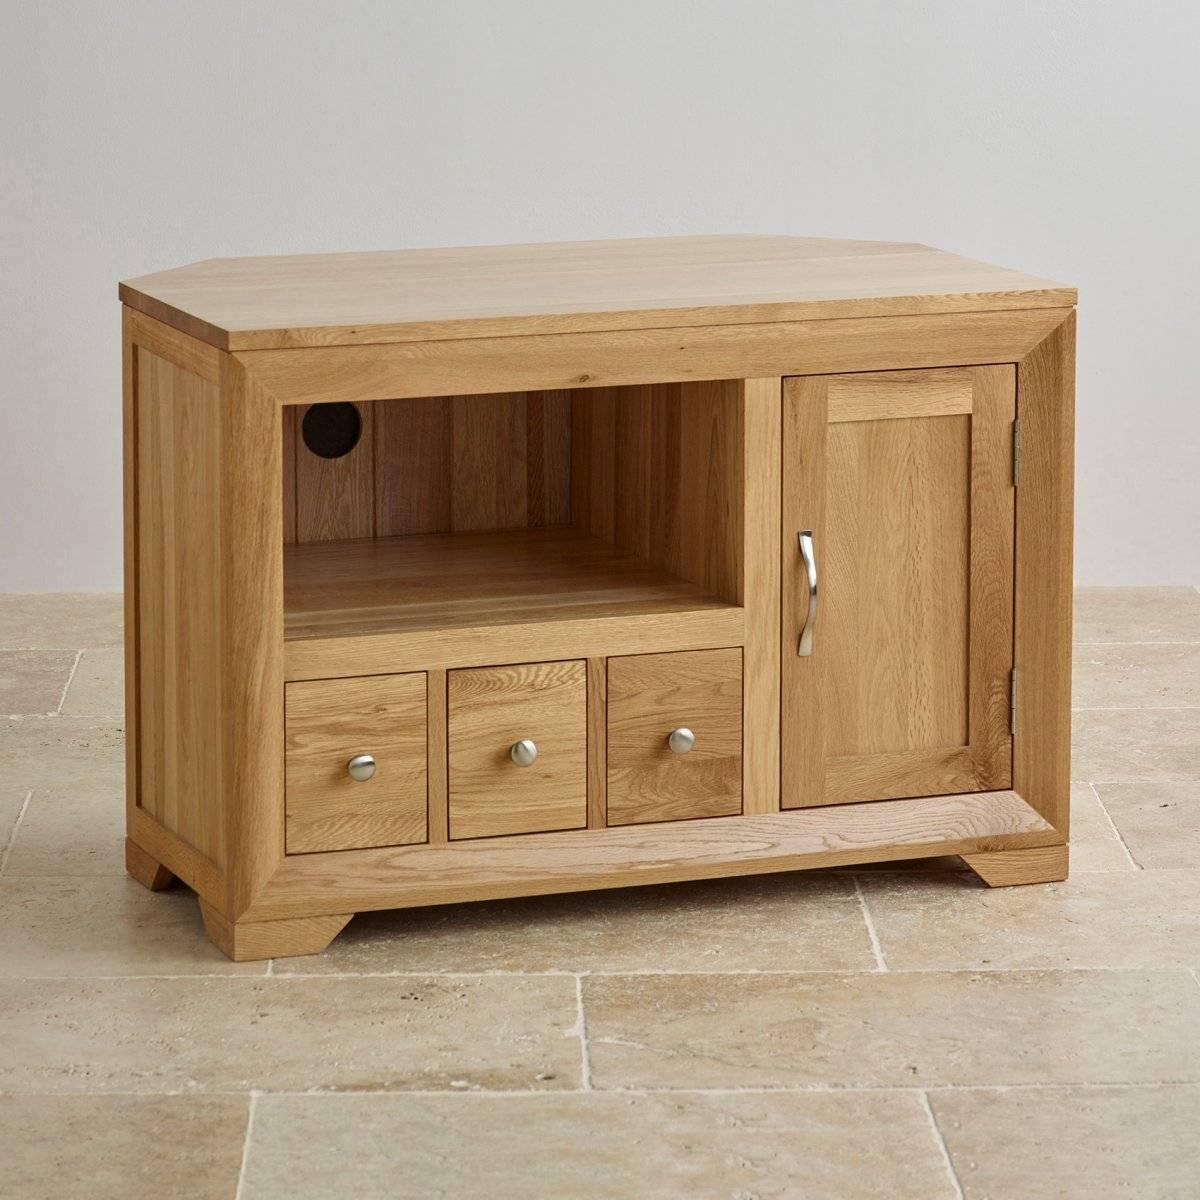 Bevel Small Corner Tv Cabinet In Solid Oak | Oak Furniture Land pertaining to Oak Corner Tv Cabinets (Image 1 of 15)